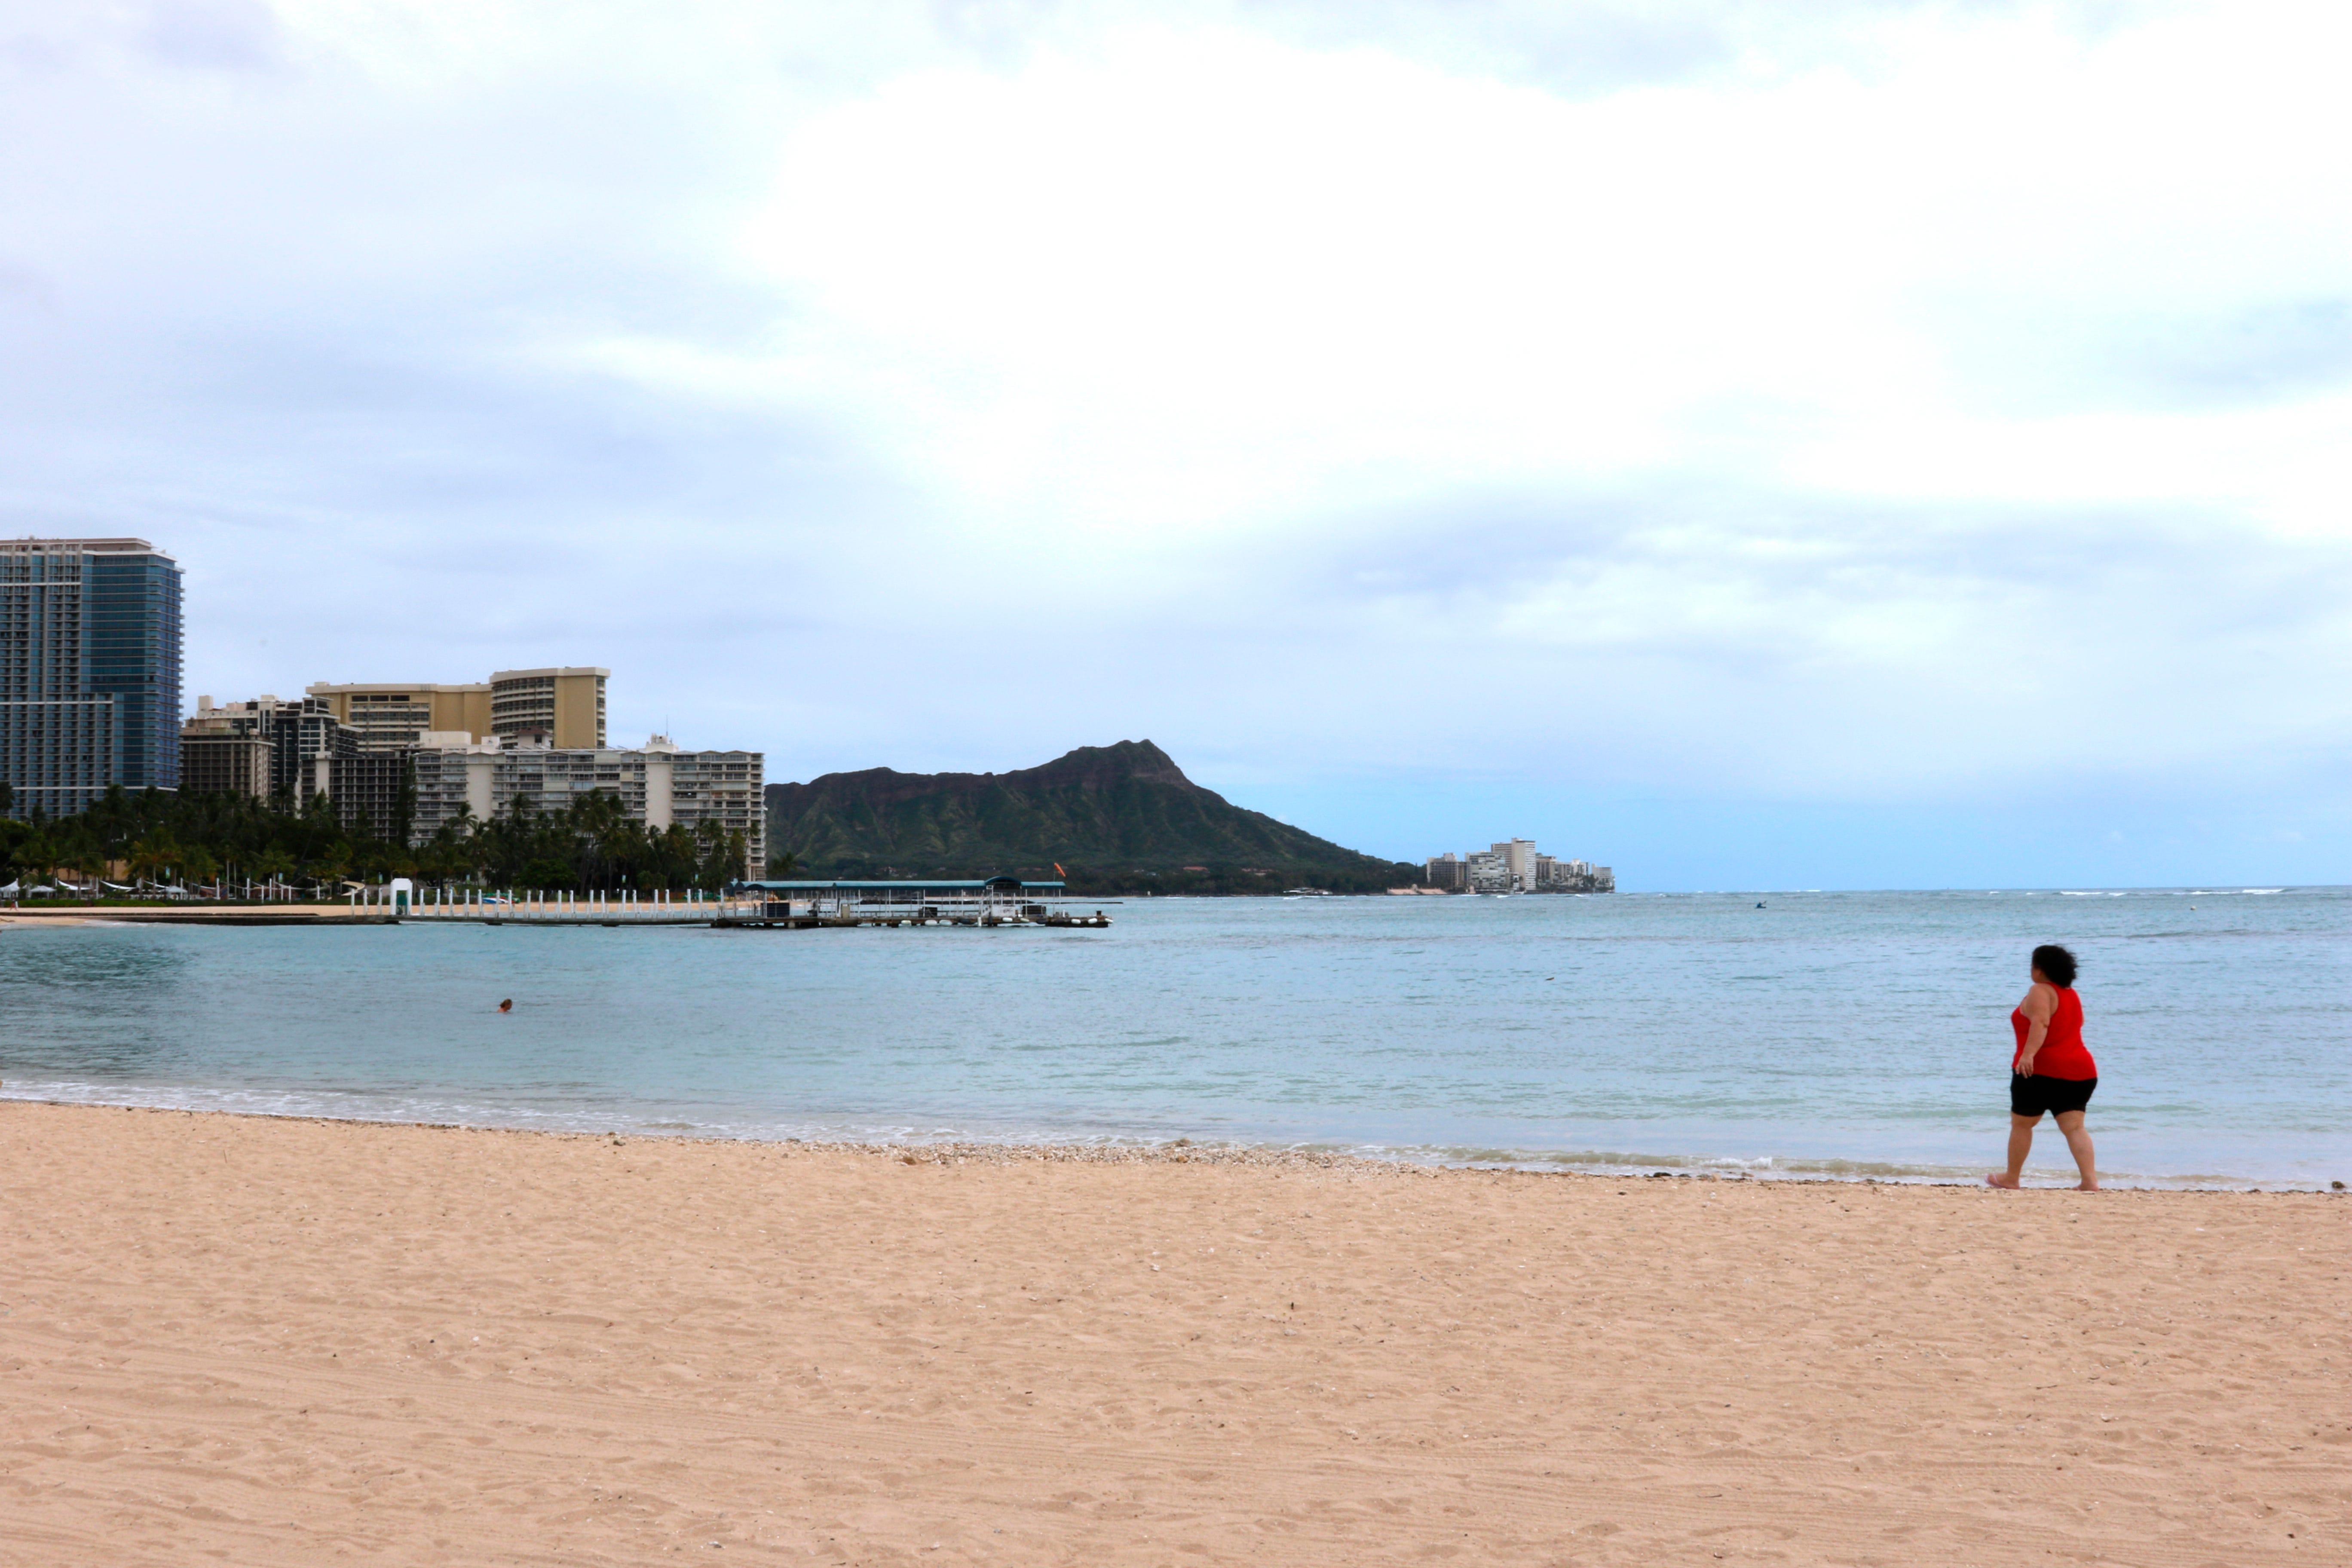 Q&A: I'm traveling to Hawaii. Do I need a coronavirus test?